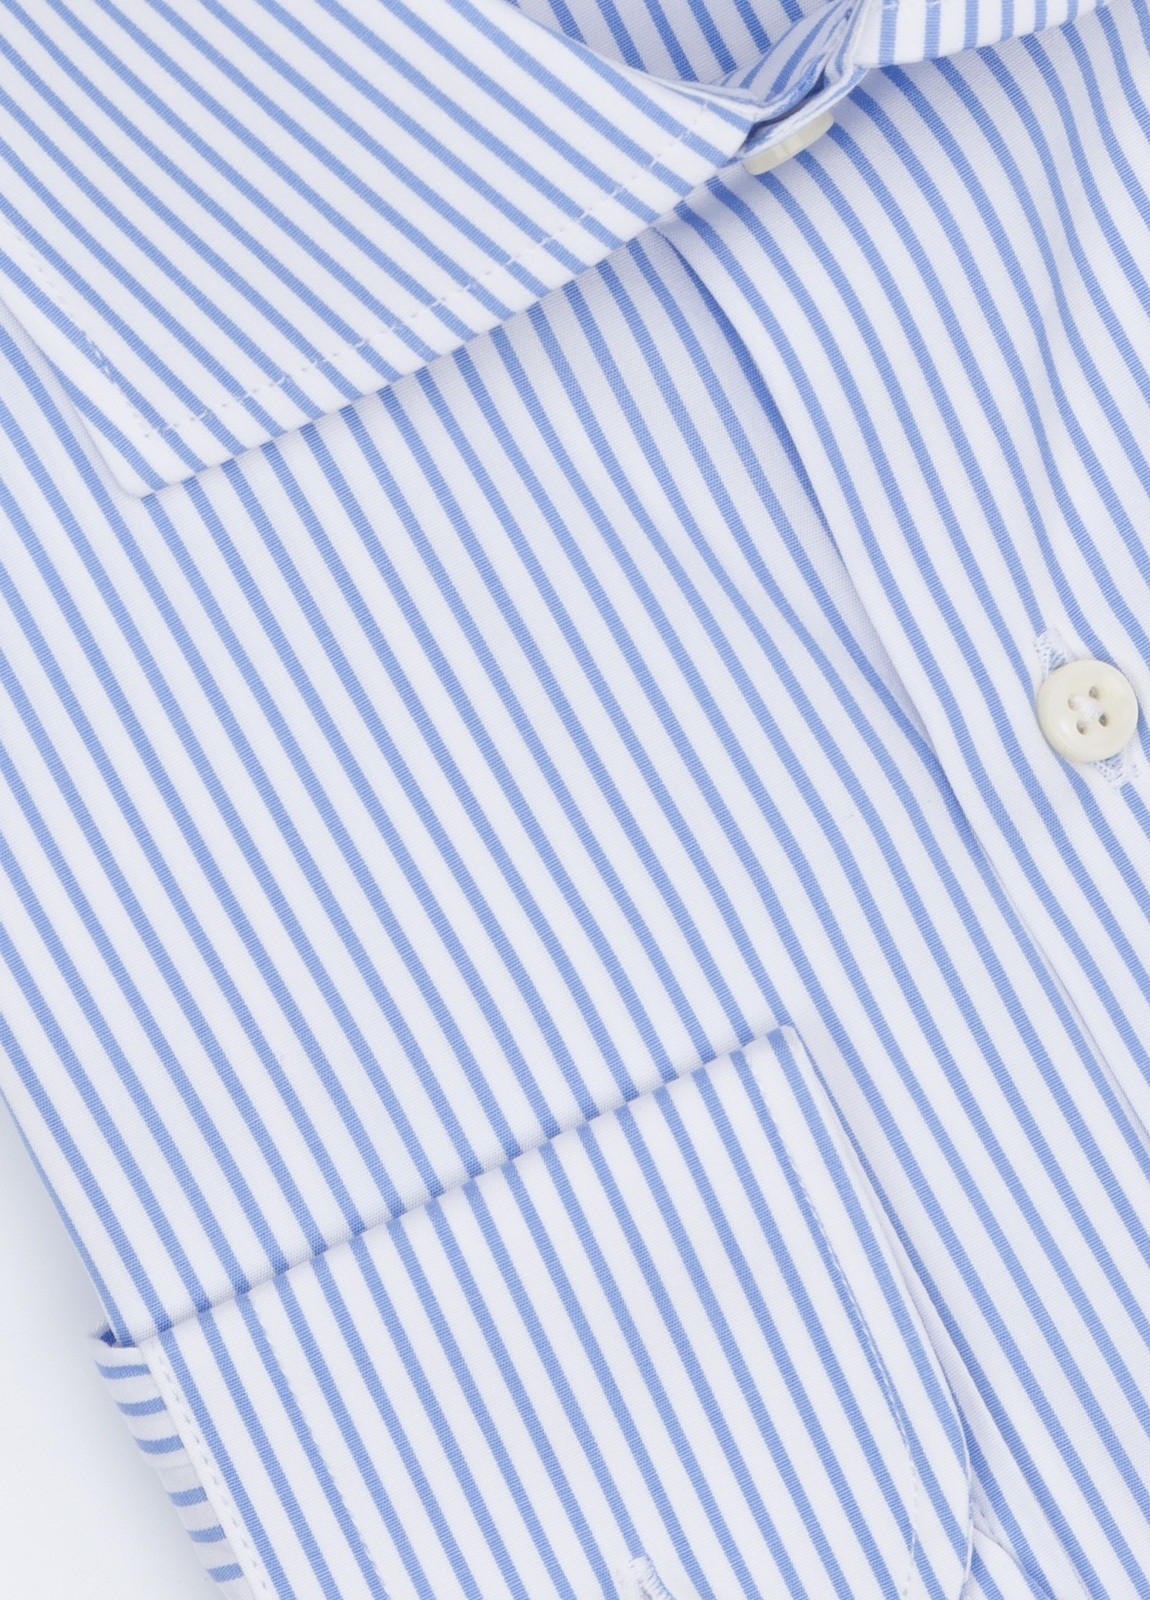 Camisa Formal Wear REGULAR FIT cuello roma modelo TAILORED NAPOLI, raya clásica color azul, 100% Algodón. - Ítem1